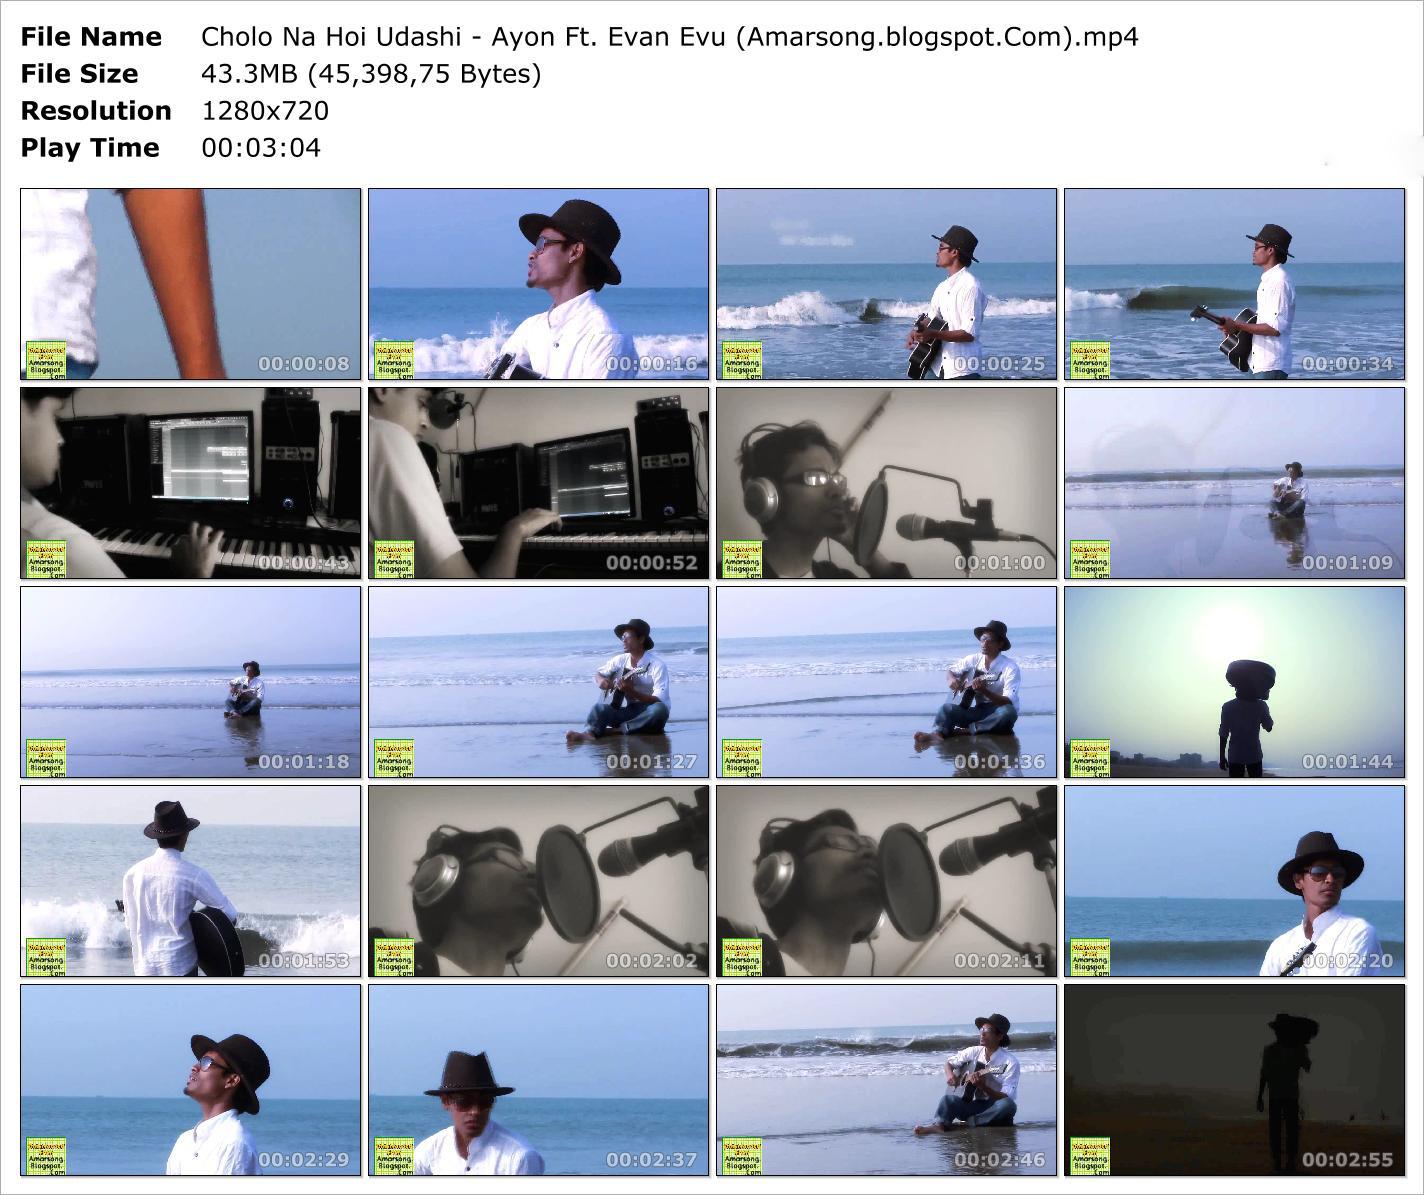 Cholo Na Hoi Udashi - Ayon Ft. Evan Evu Video Download Mp4 Format